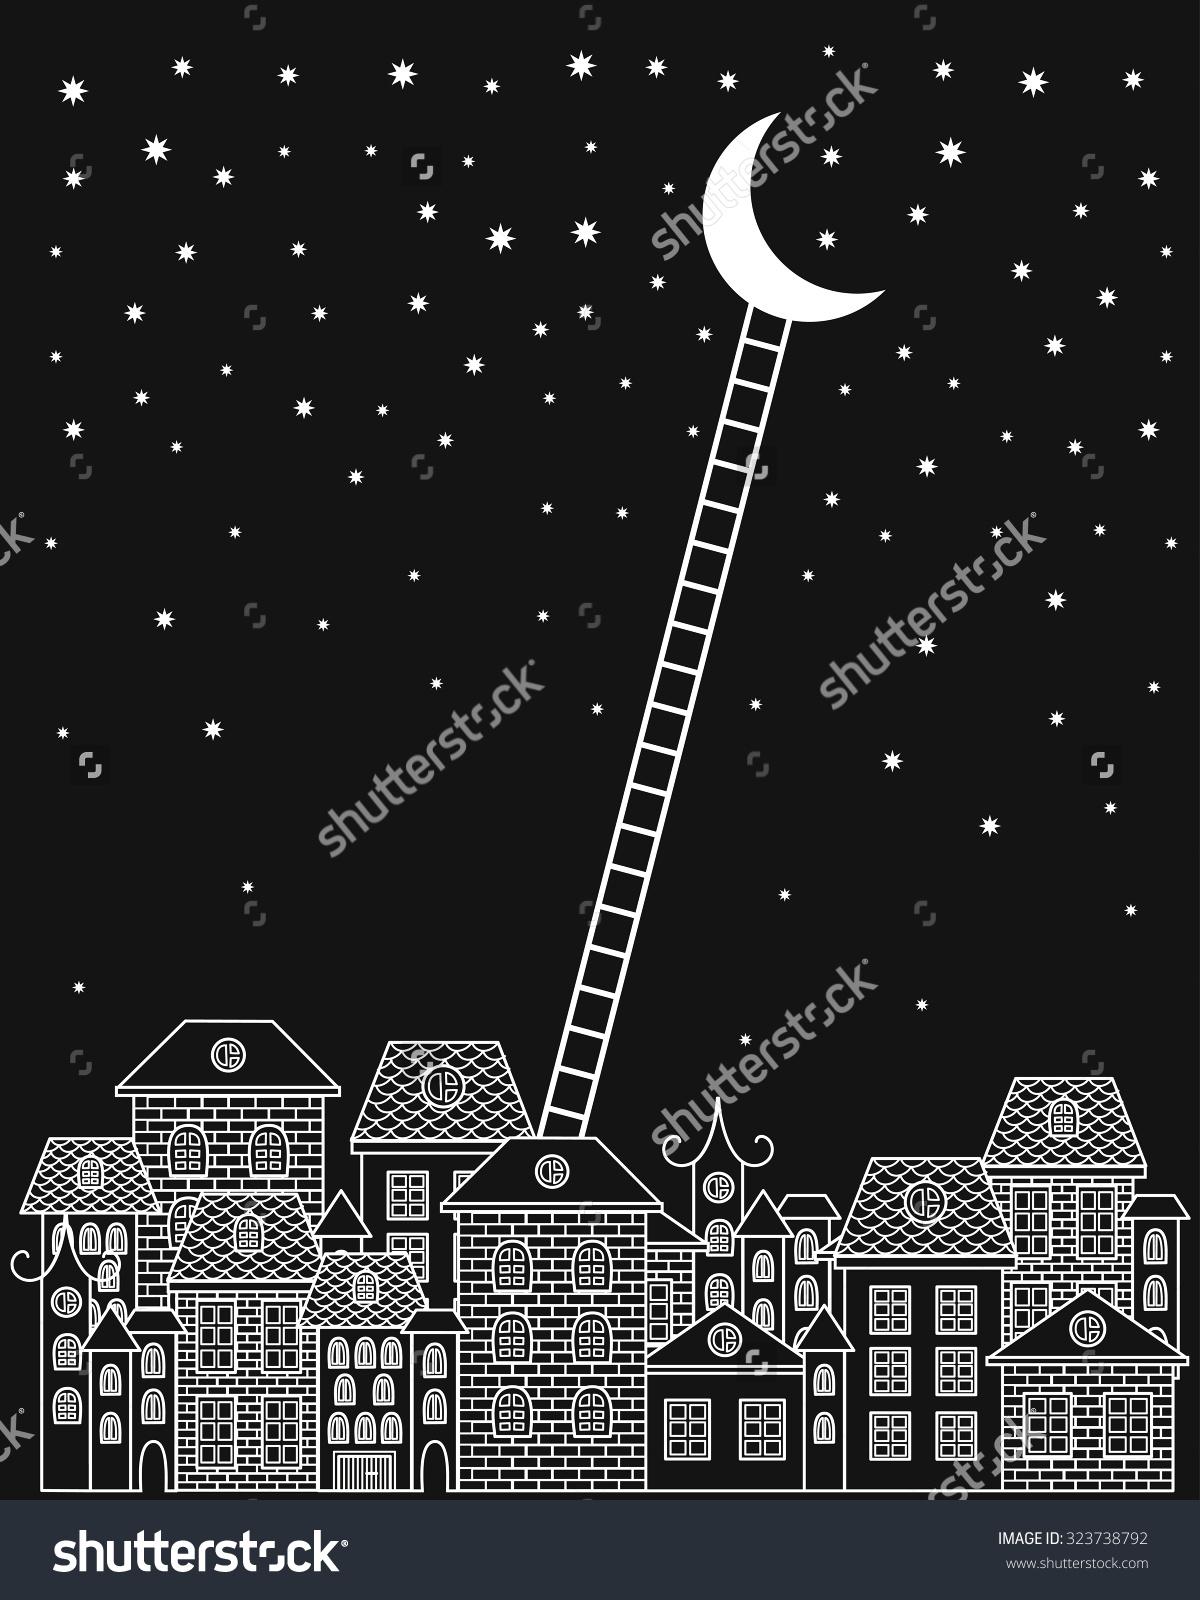 Night Sky clipart night skyline And sky night Sky Cliparts